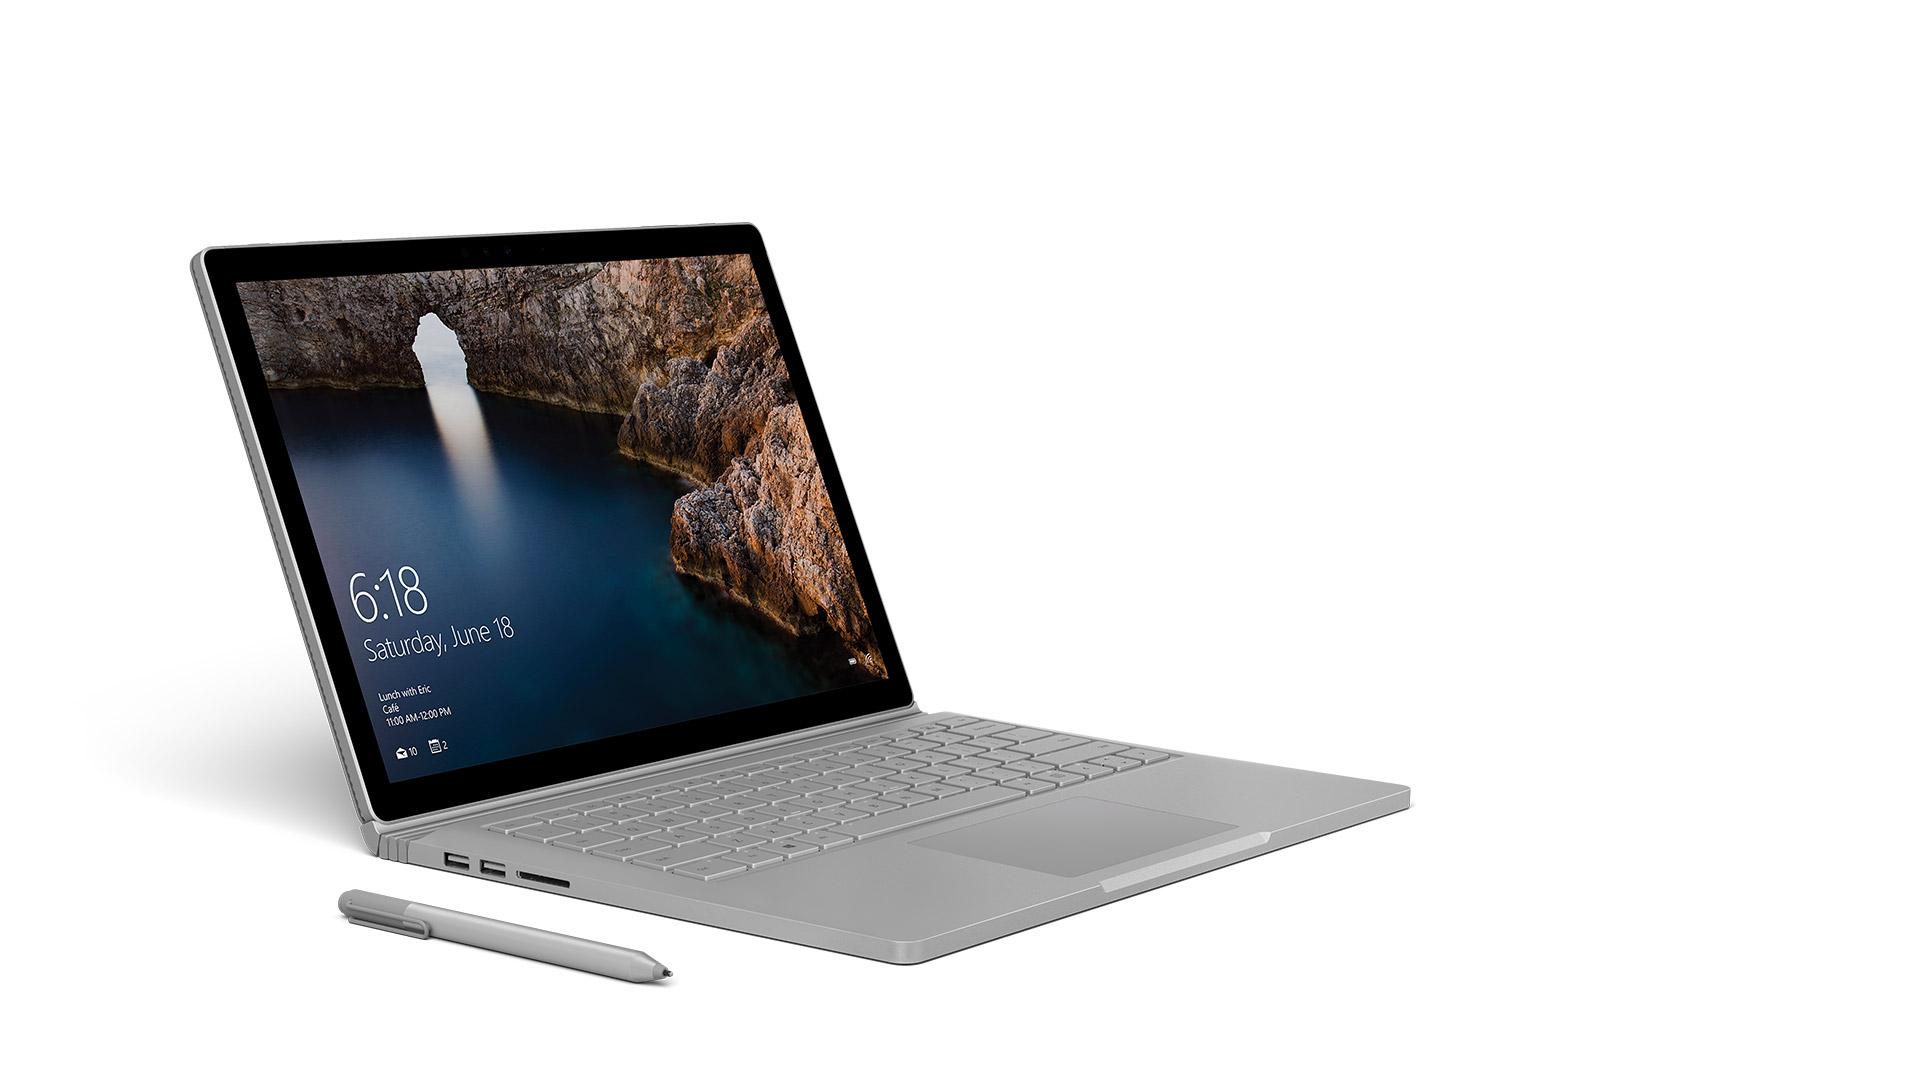 Surface Book met Surface-pen, naar rechts gericht